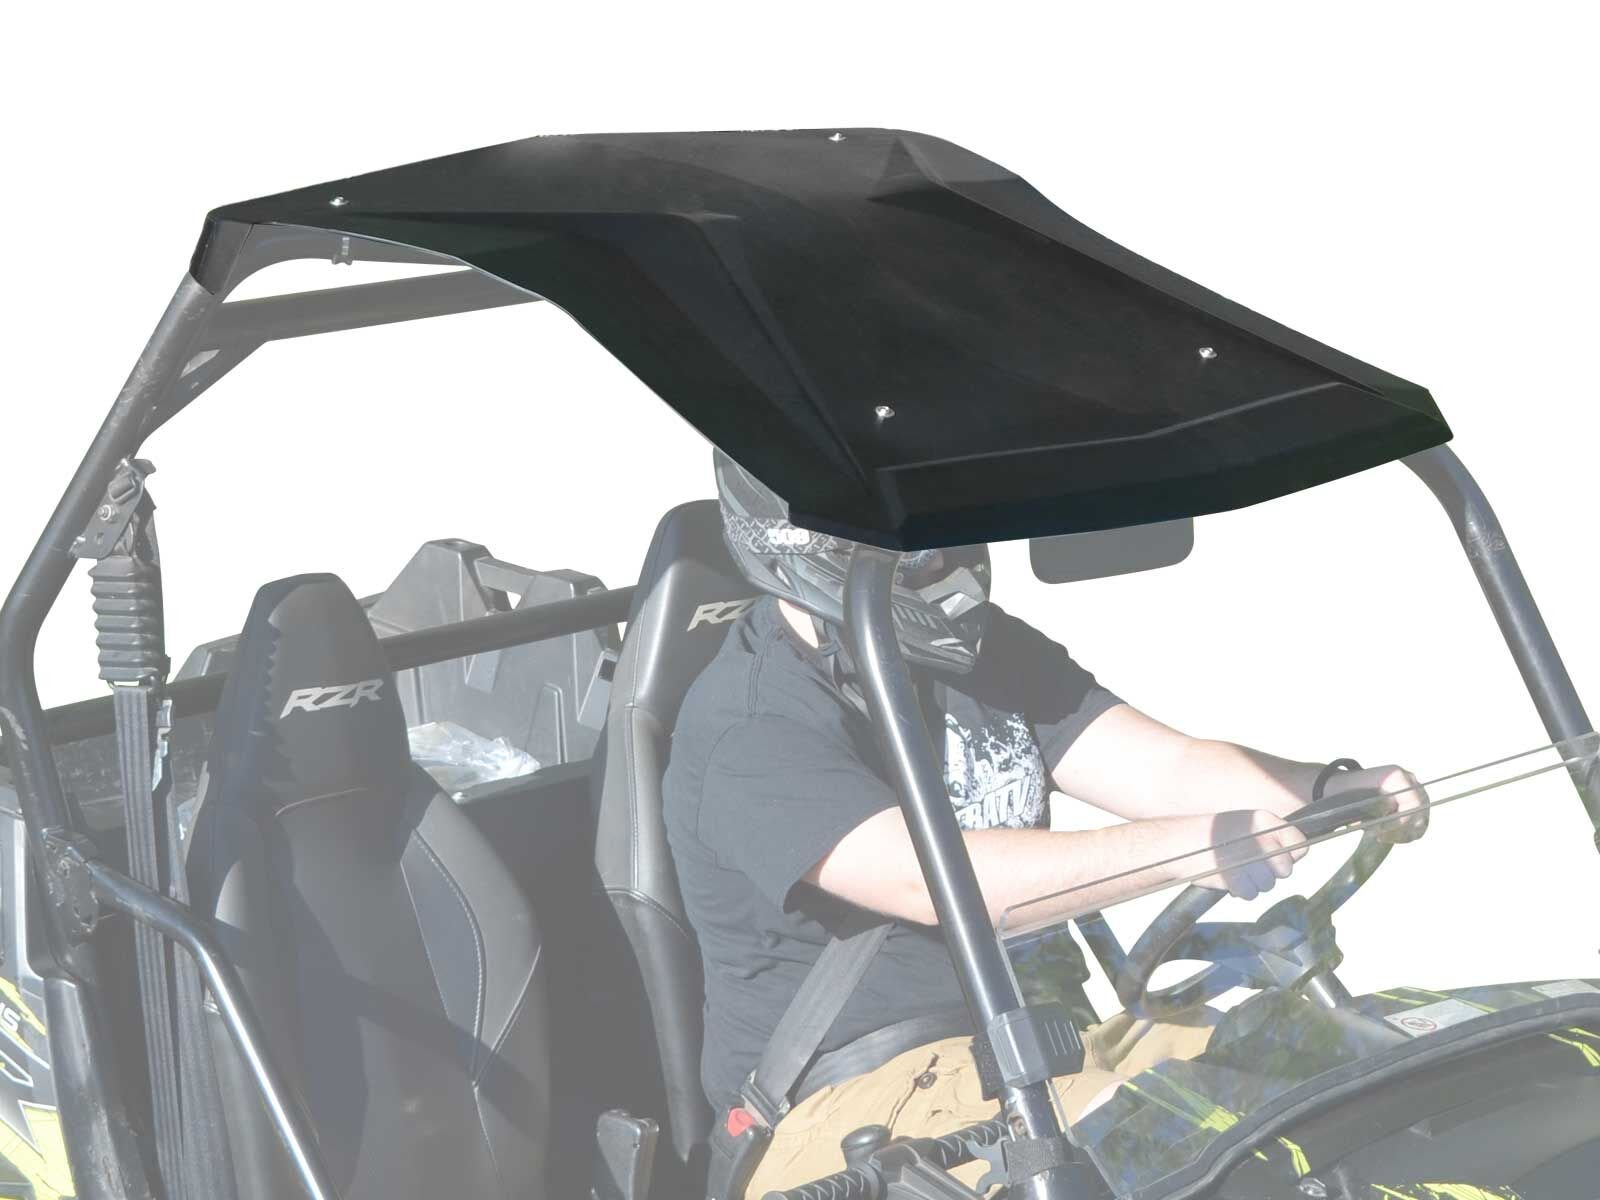 SuperATV Heavy Duty Plastic Roof for Polaris RZR 800/800 S/XP 900/570 - Easy to Install!